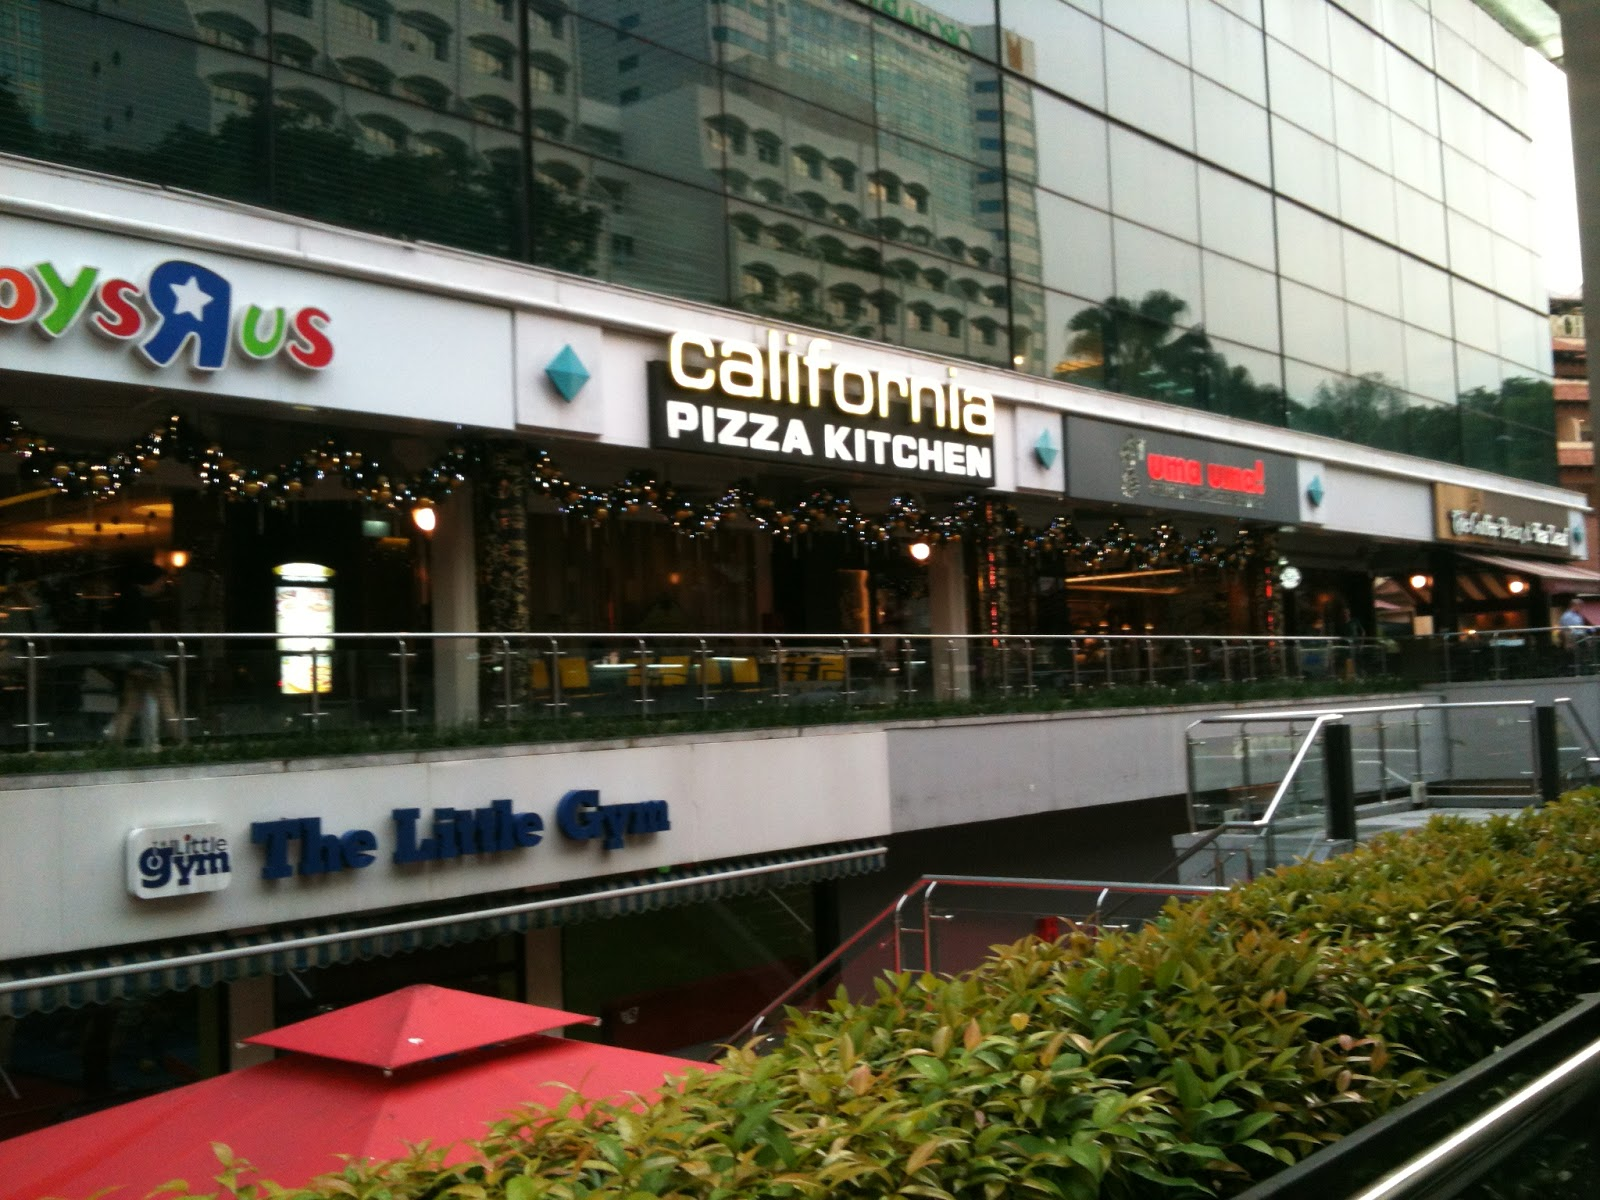 California Pizza Kitchen Singapore